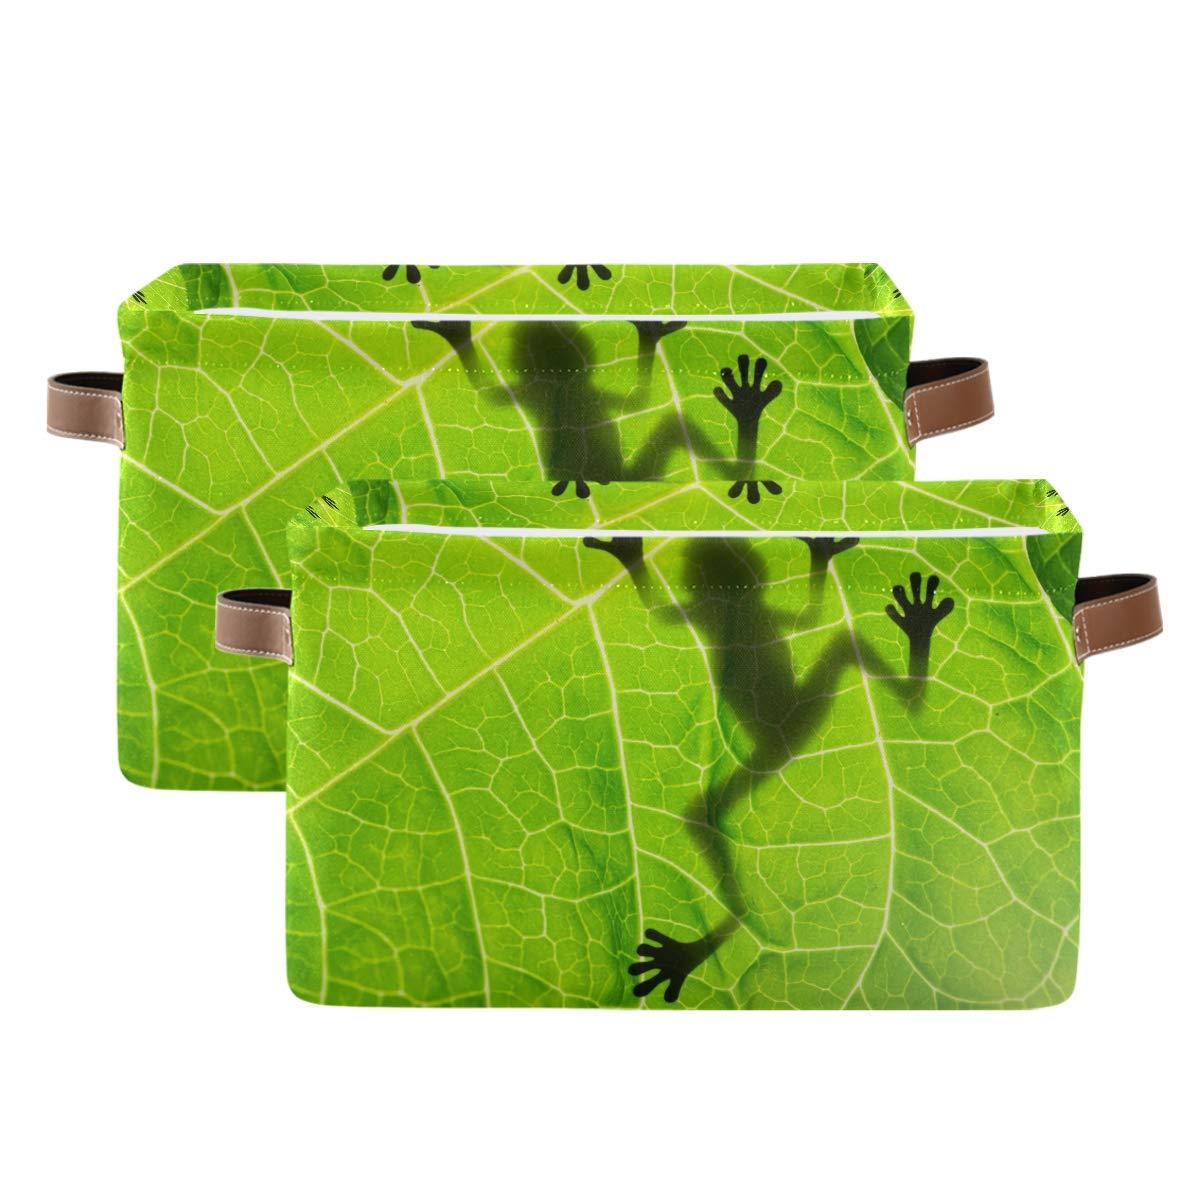 WXLIFE Storage Basket Bombing free shipping Bins Tropical La free Frog Shadow Leaves Animal